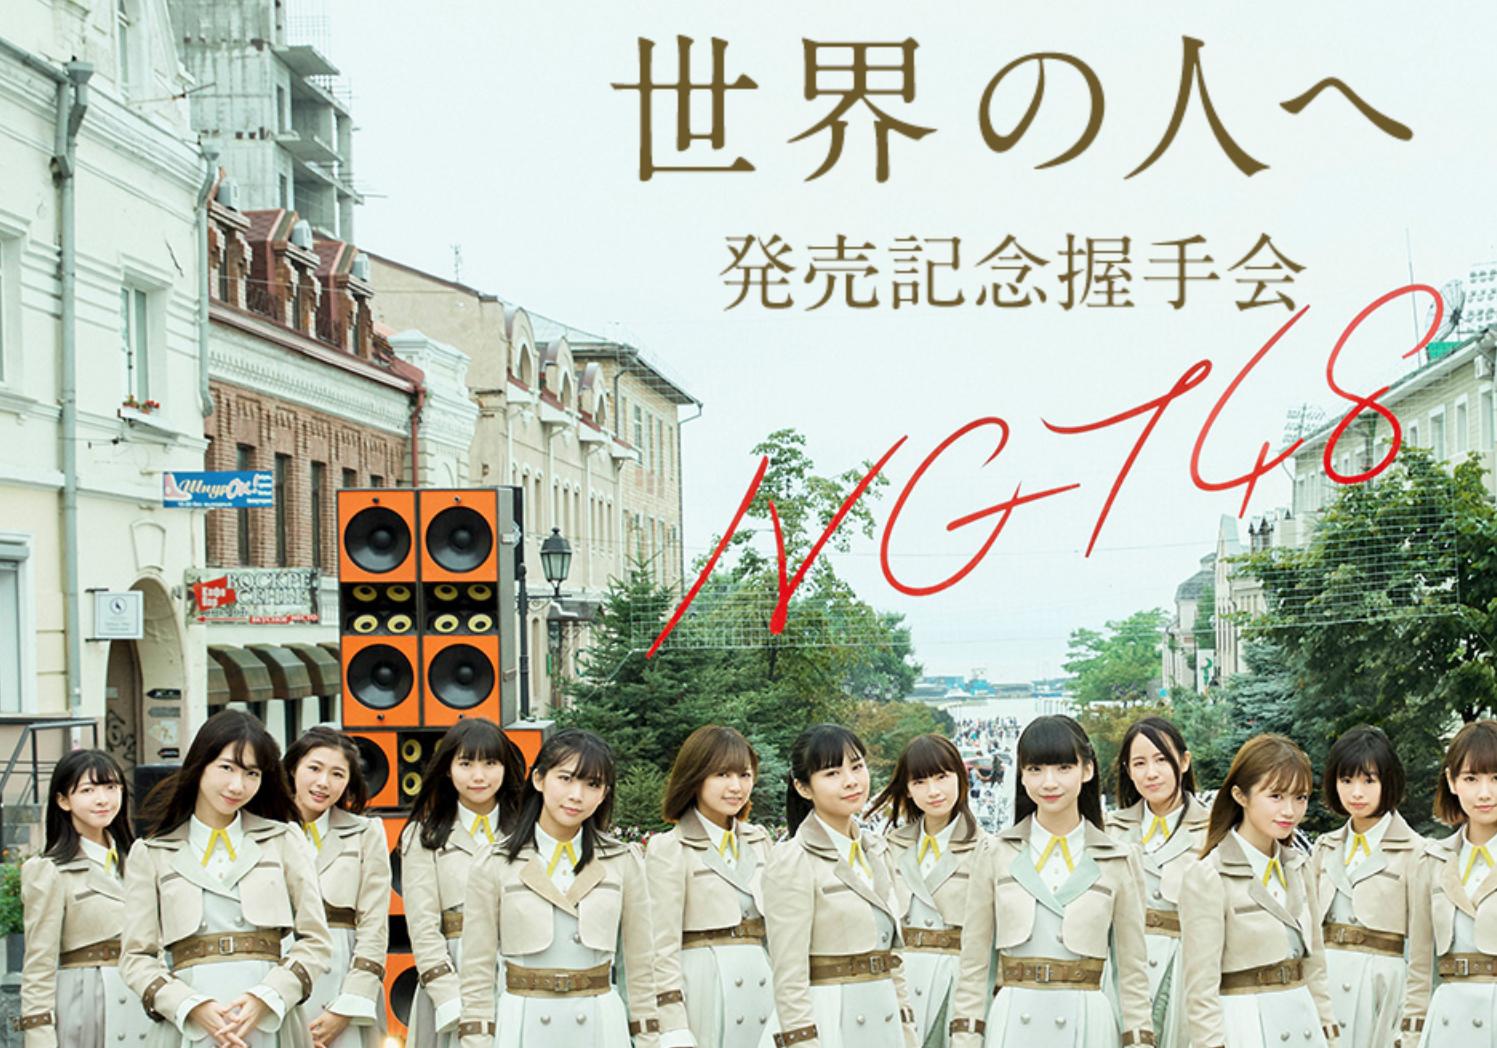 "NGT48山口真帆暴行事件のウラにある、地方アイドル""距離の近さ""の危険性"